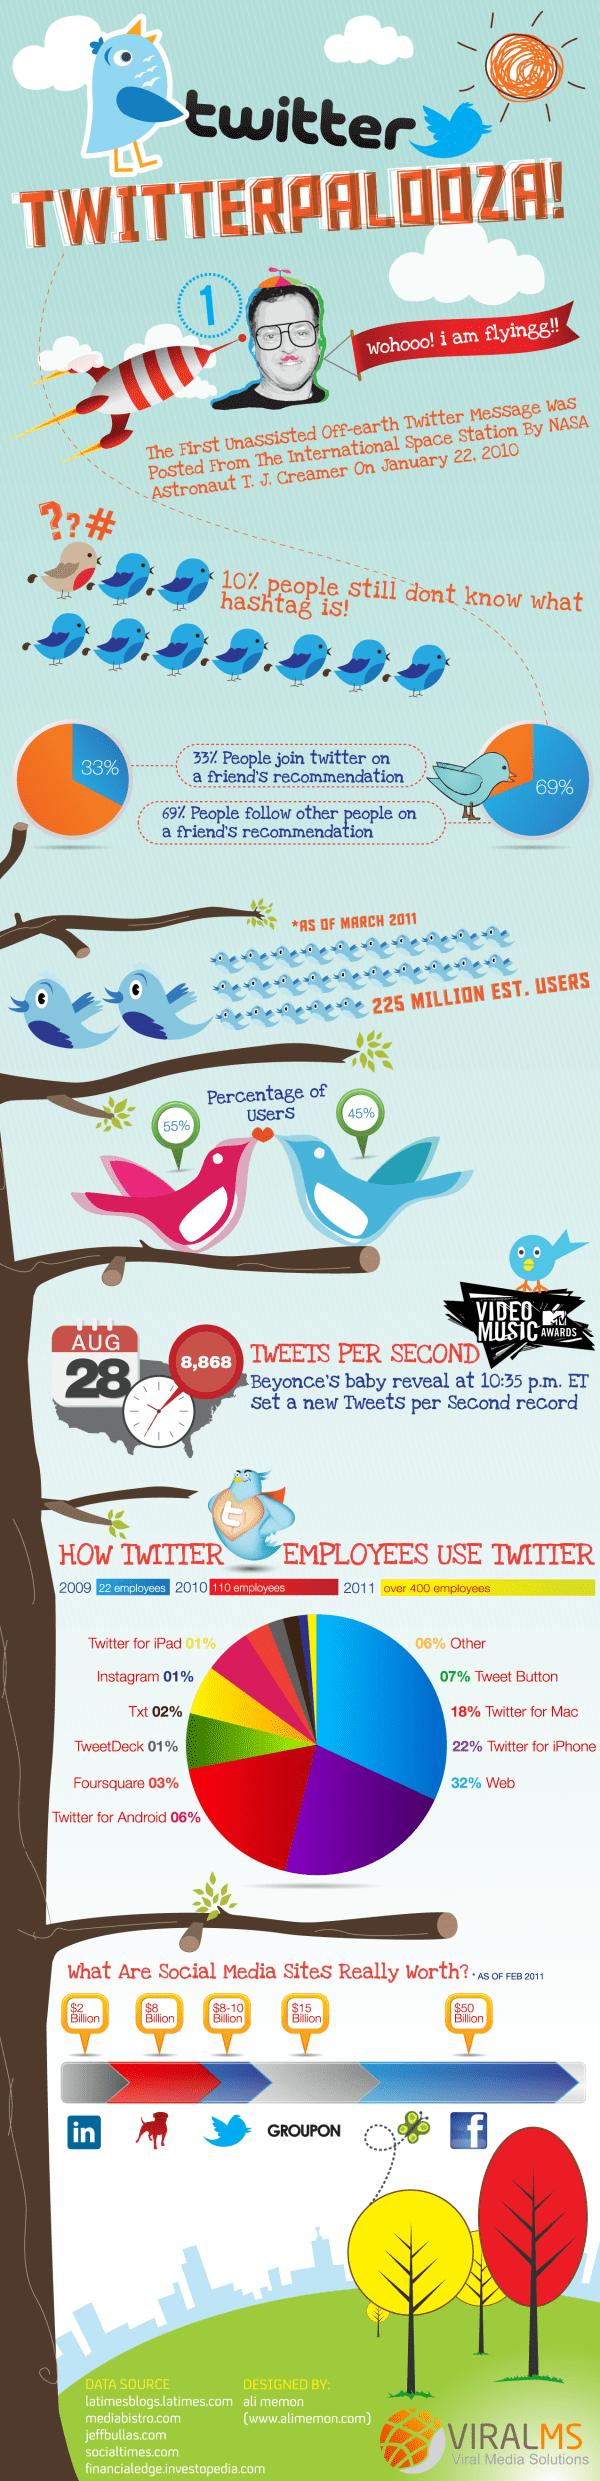 infographic-on-social-media-19